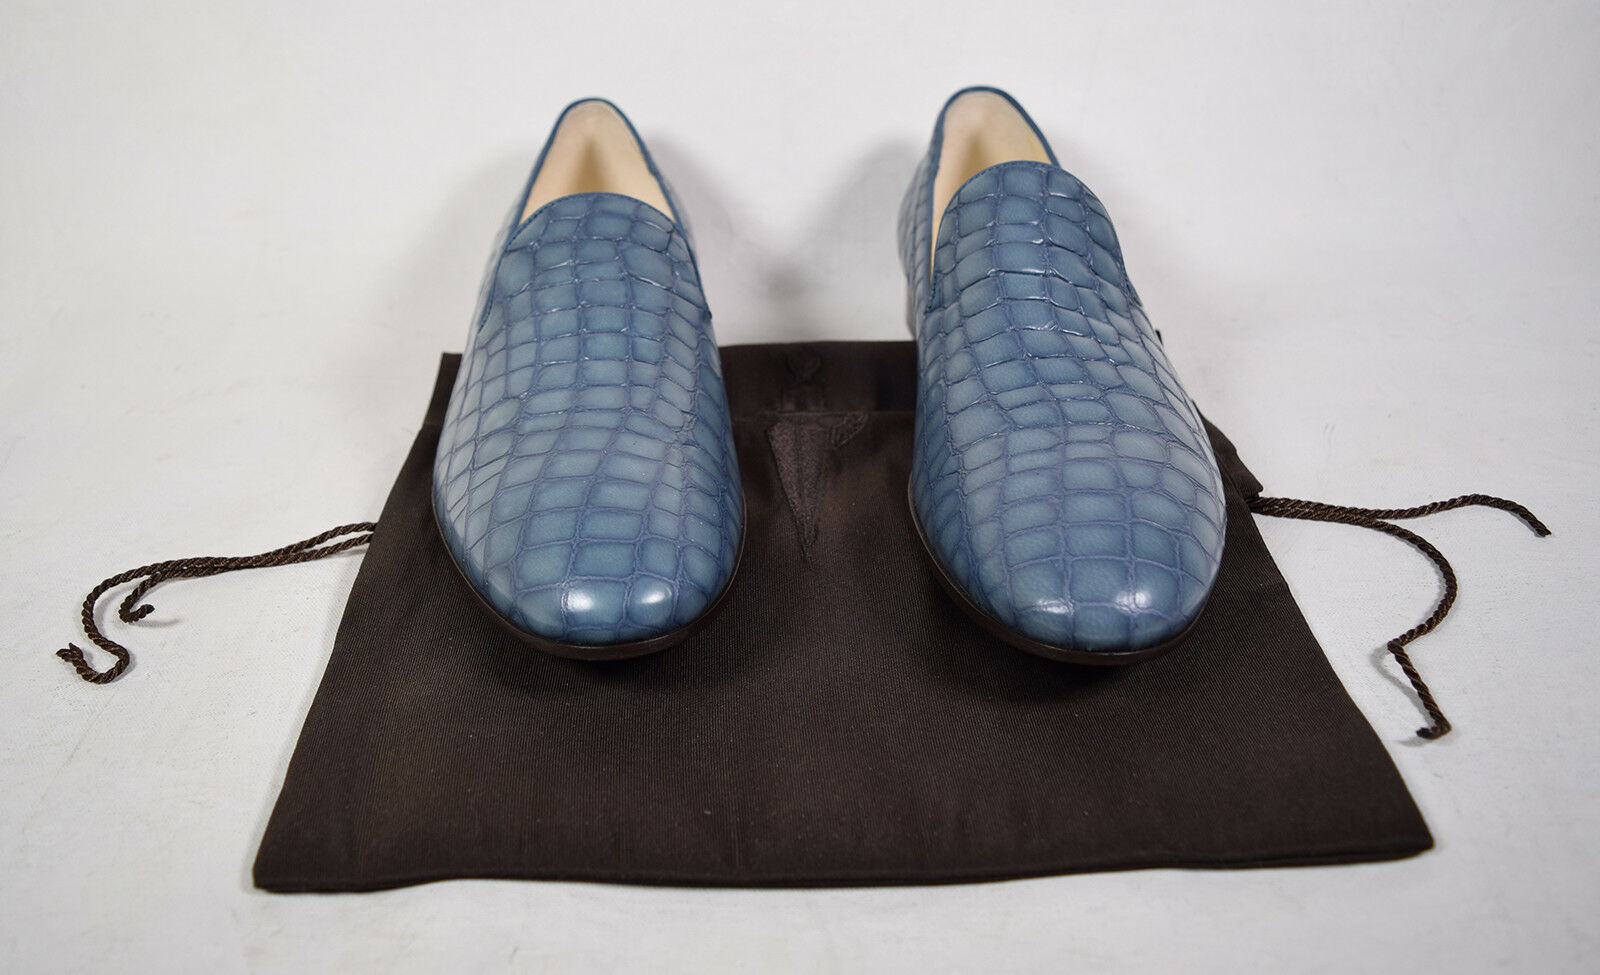 Nicole Simon Mens Loafer Leather Croc Print blu Slip On 8